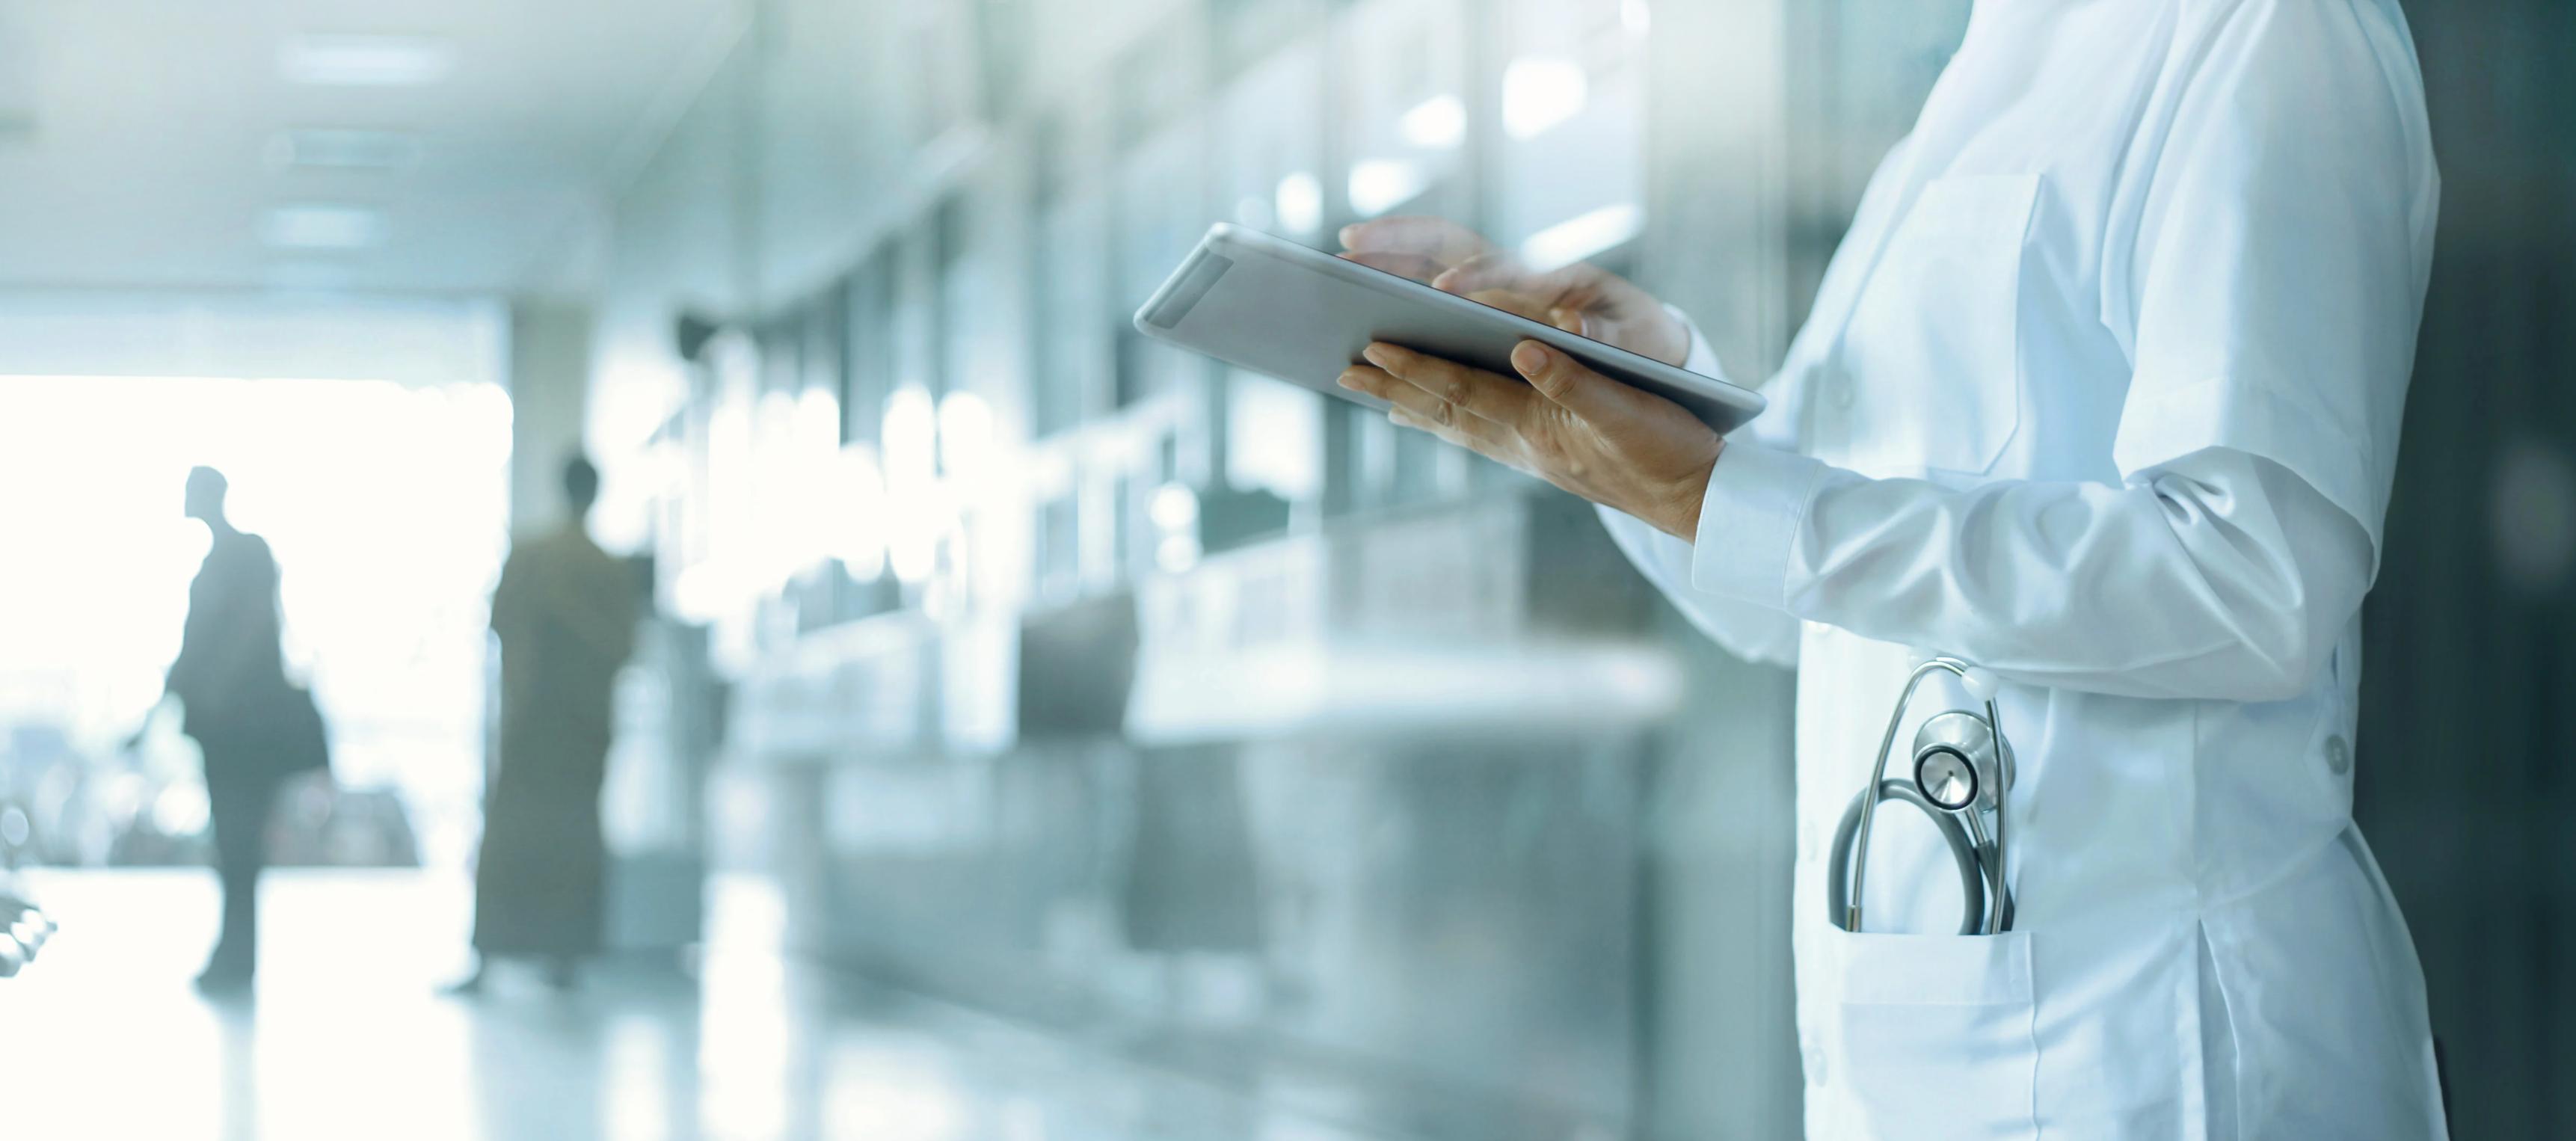 physician-tablet-cardio-server-2